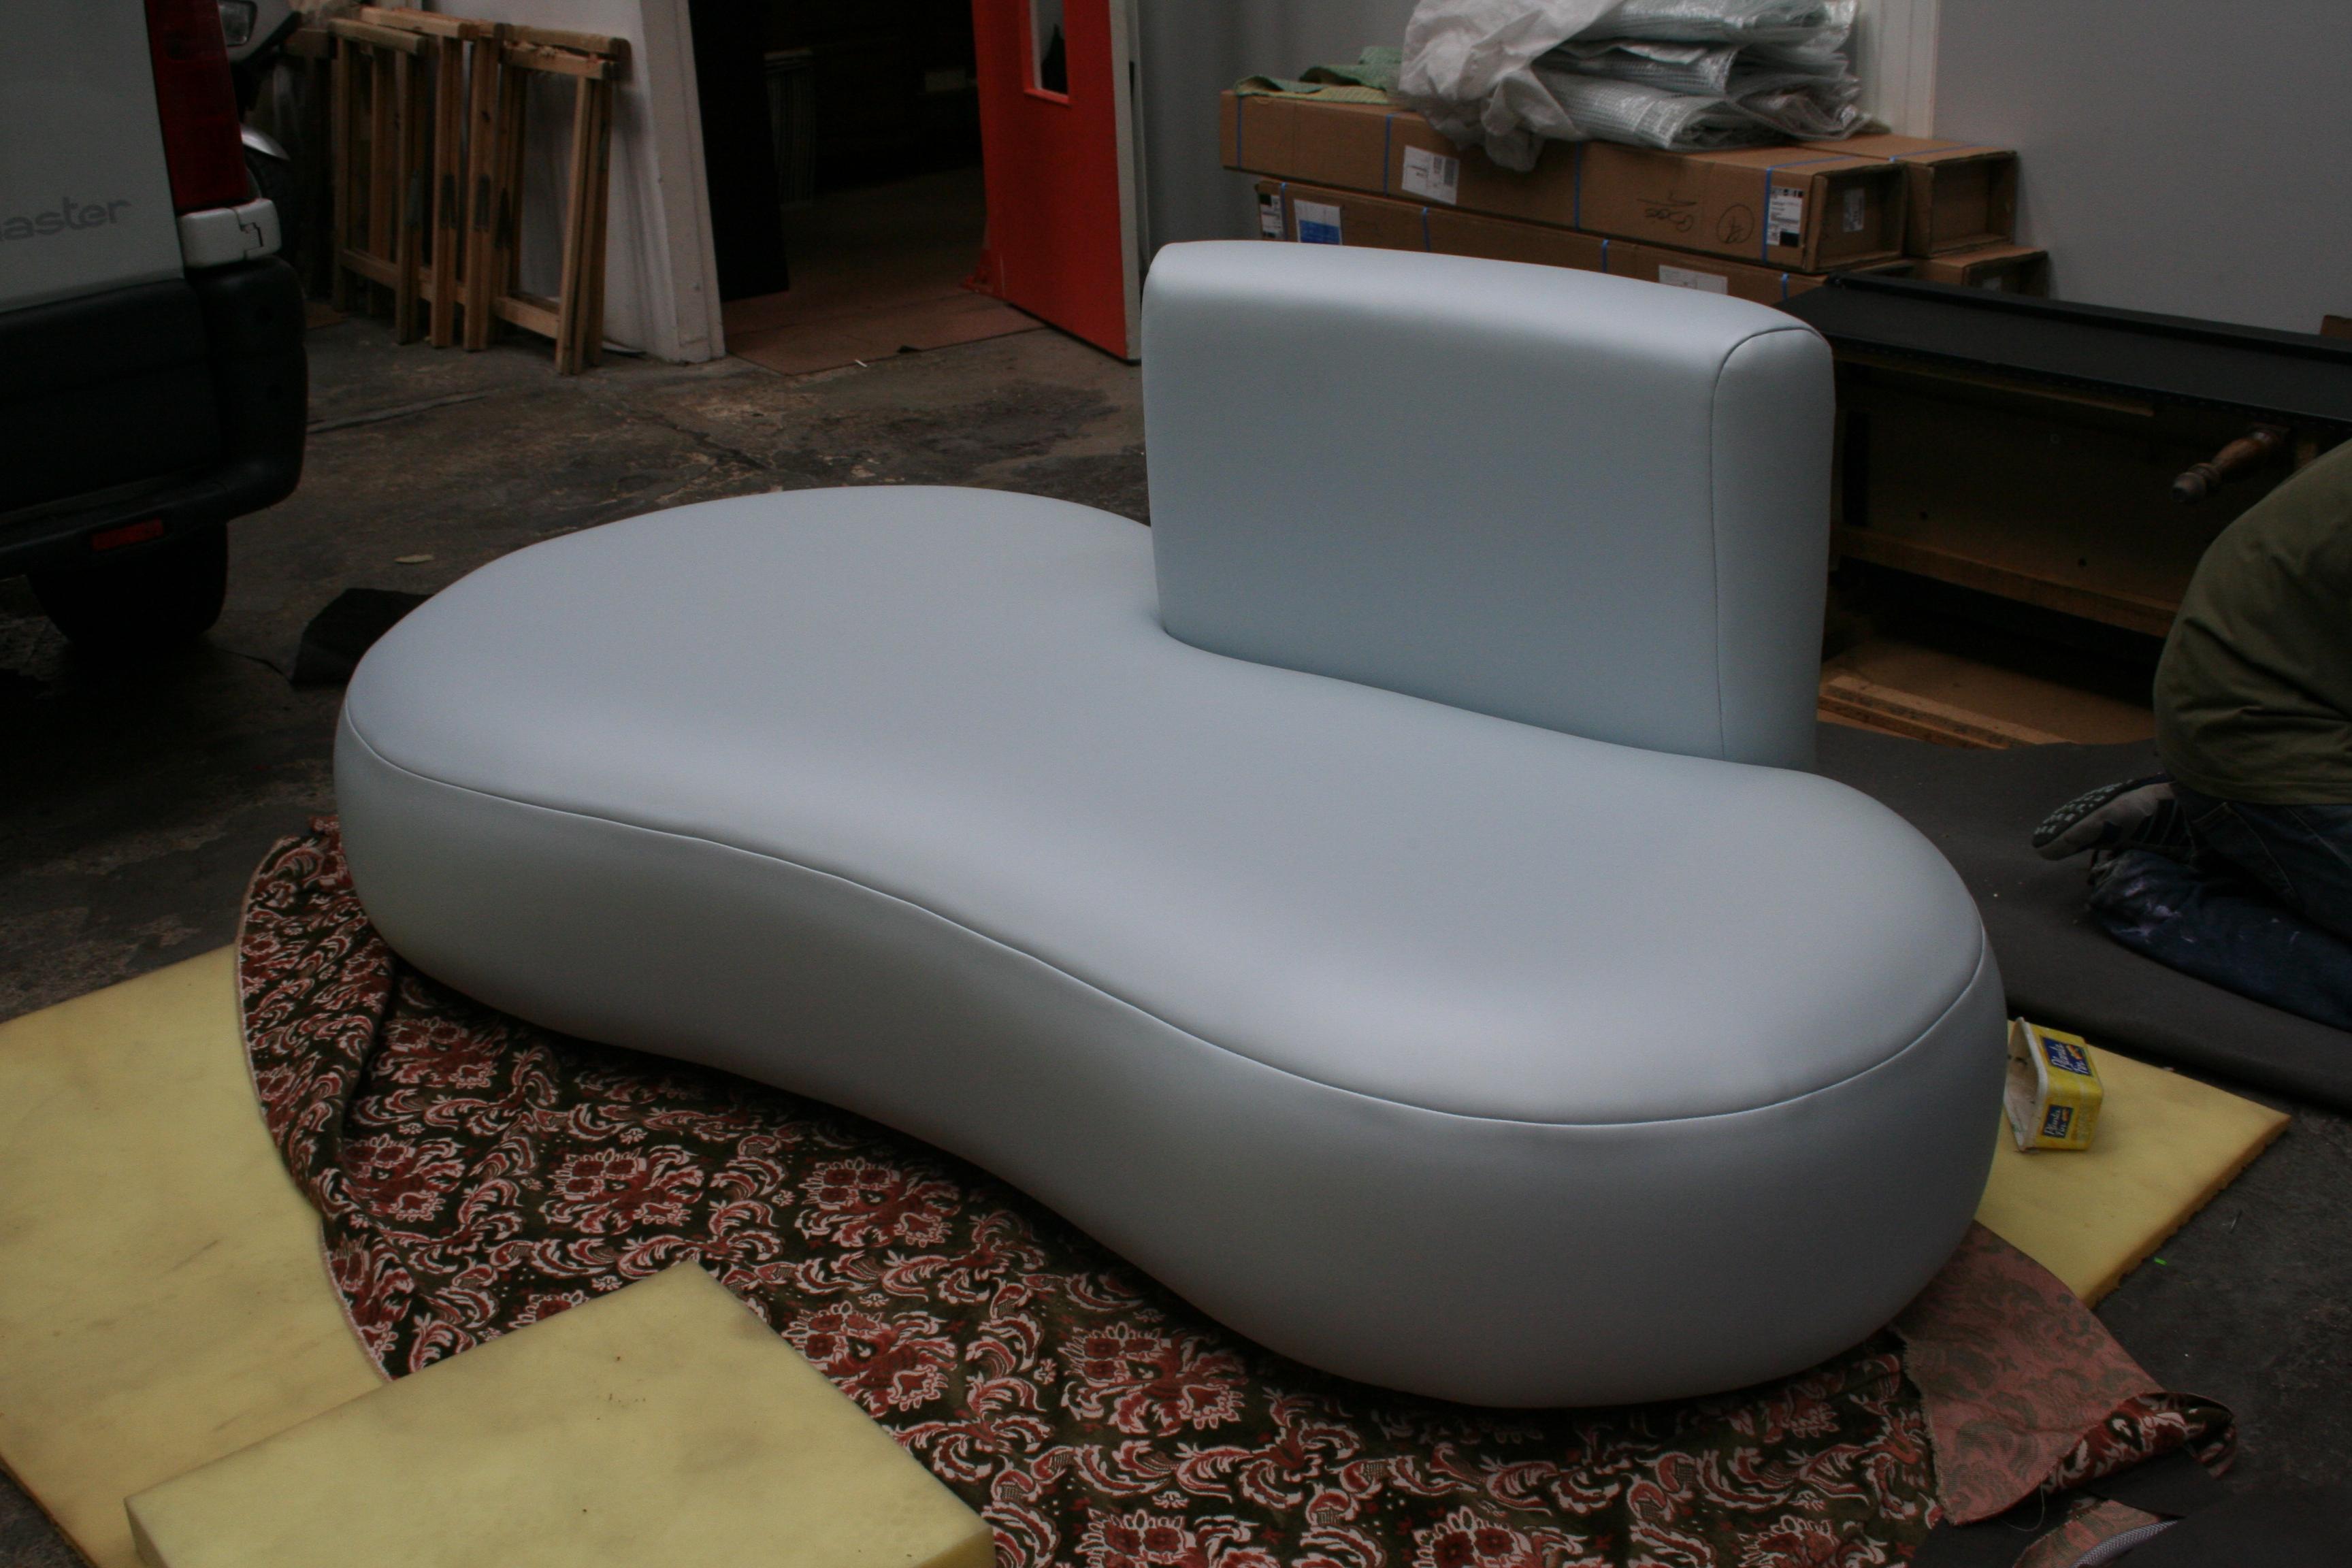 banquette haricot cuir blanc jplecomte mobilier. Black Bedroom Furniture Sets. Home Design Ideas